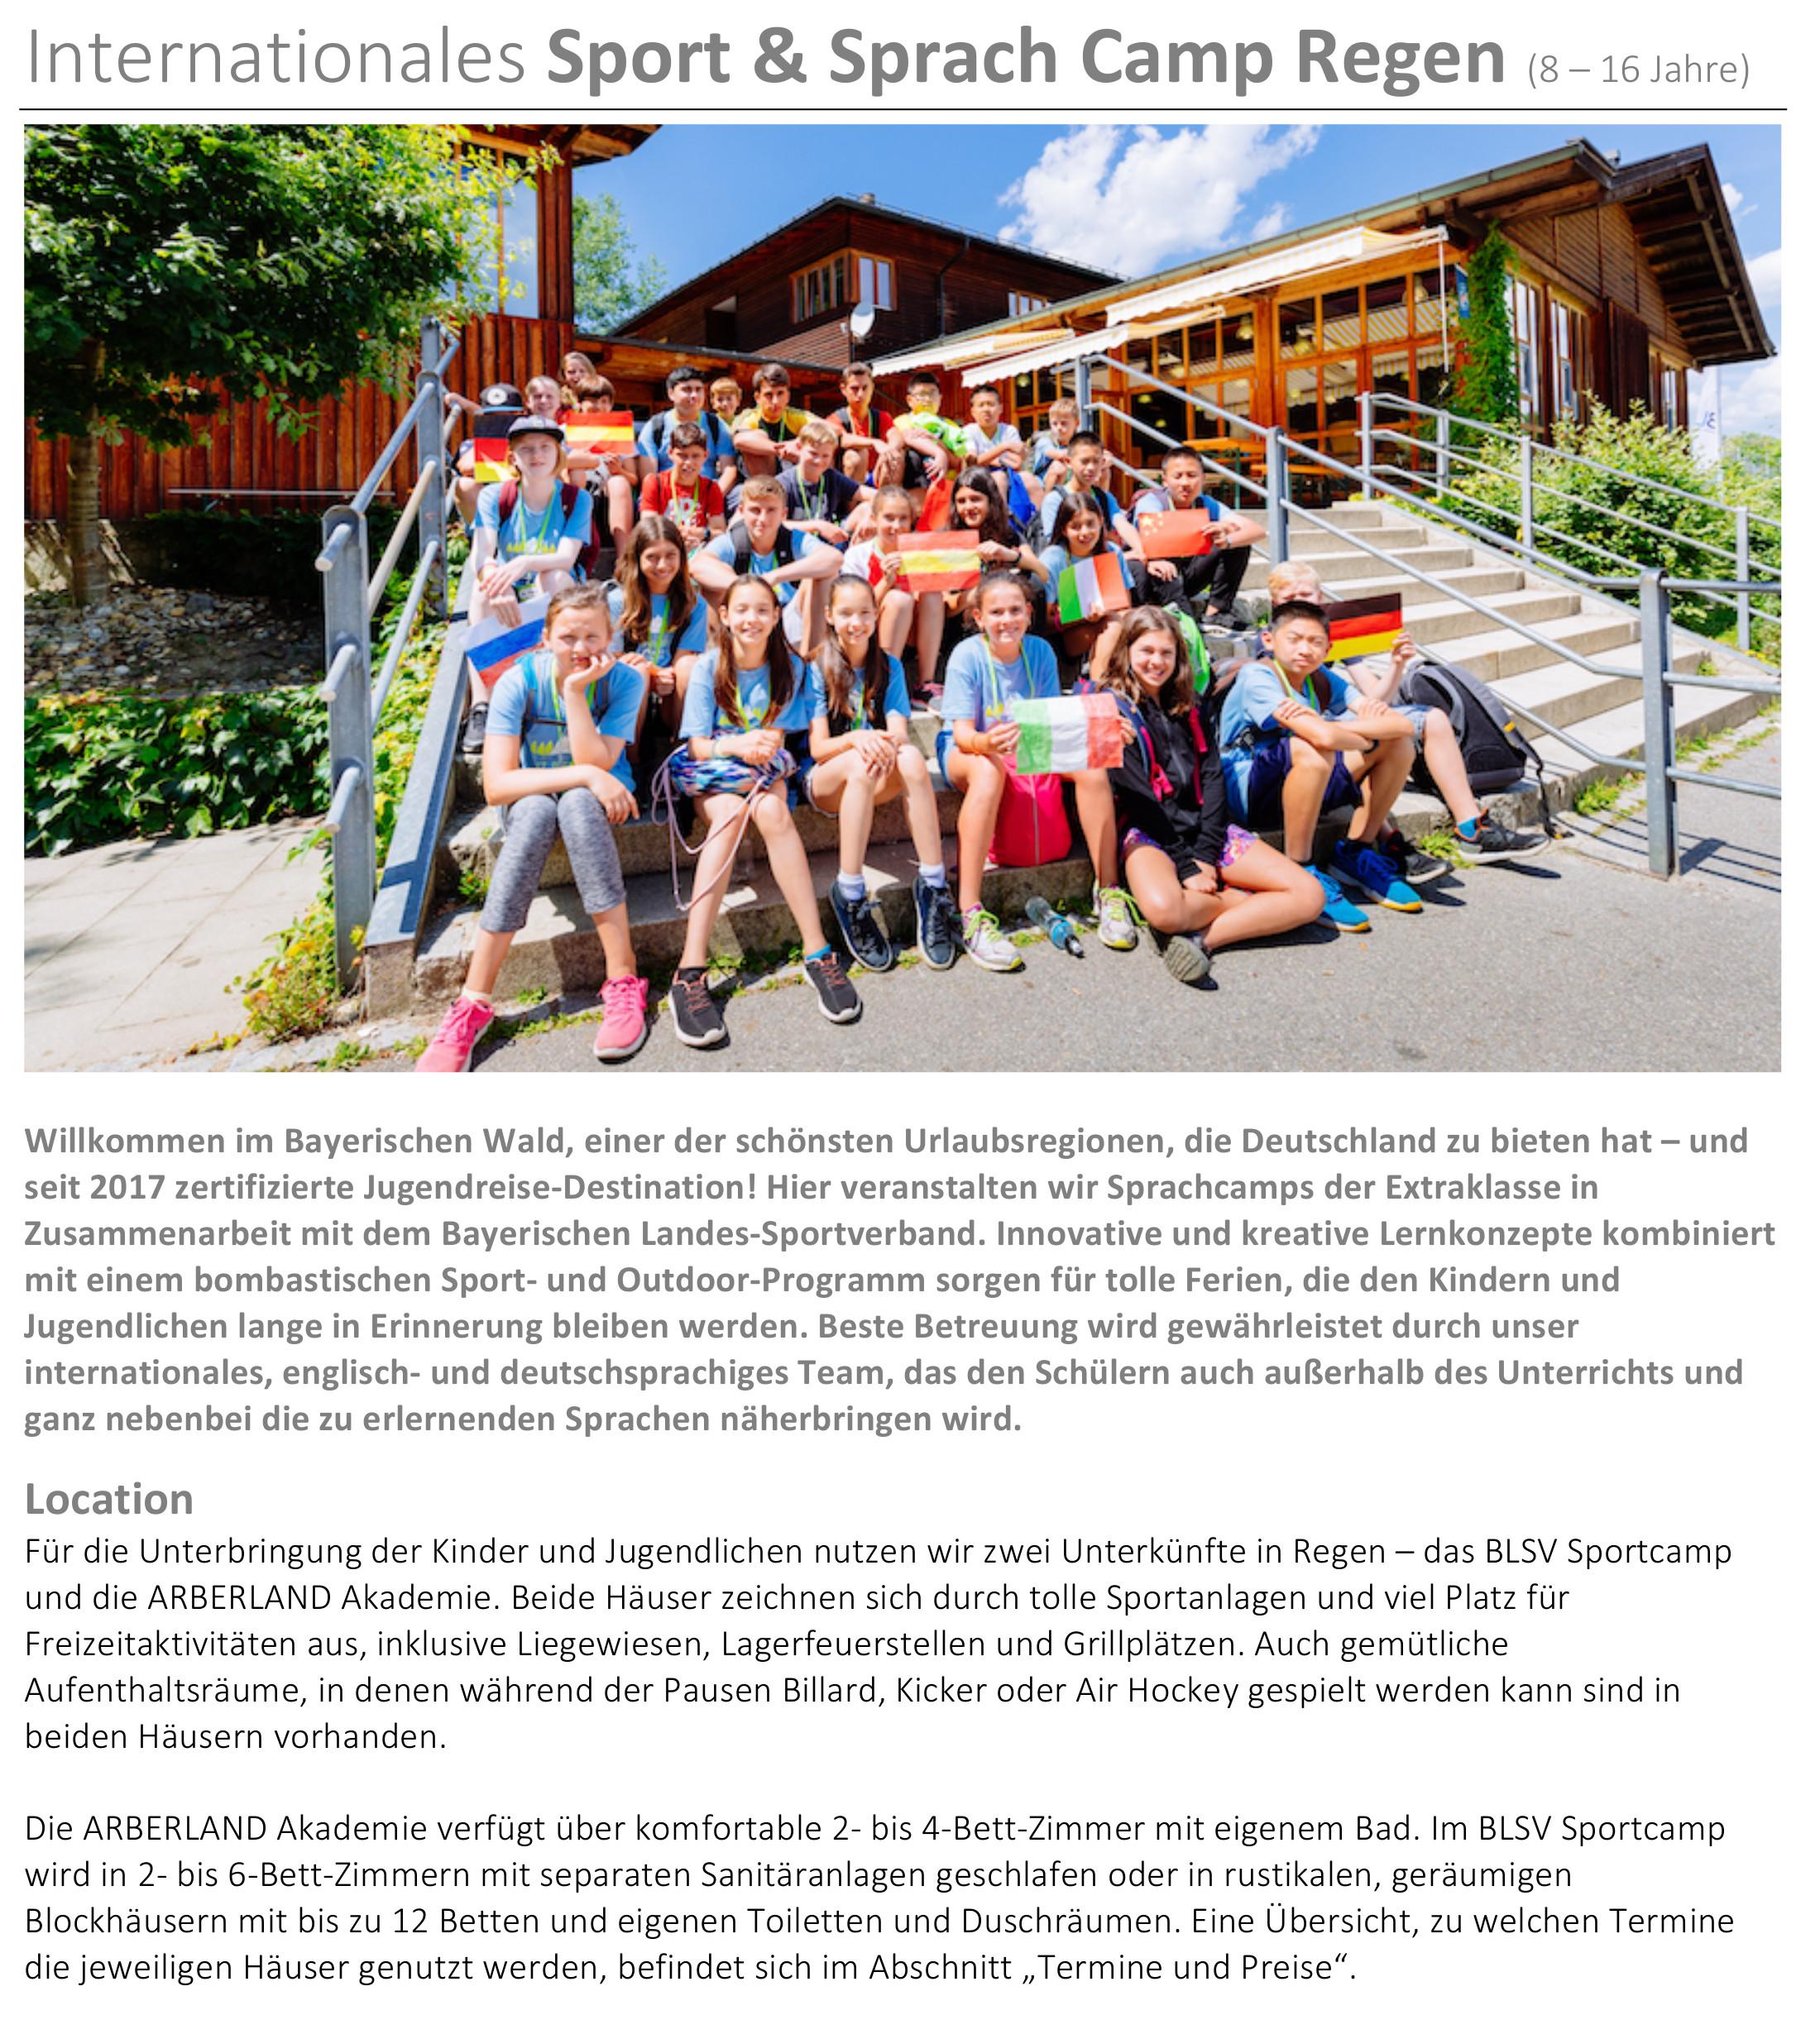 Ferias Teen - Alemanha - Regen - 2018 - 1 GER.jpg